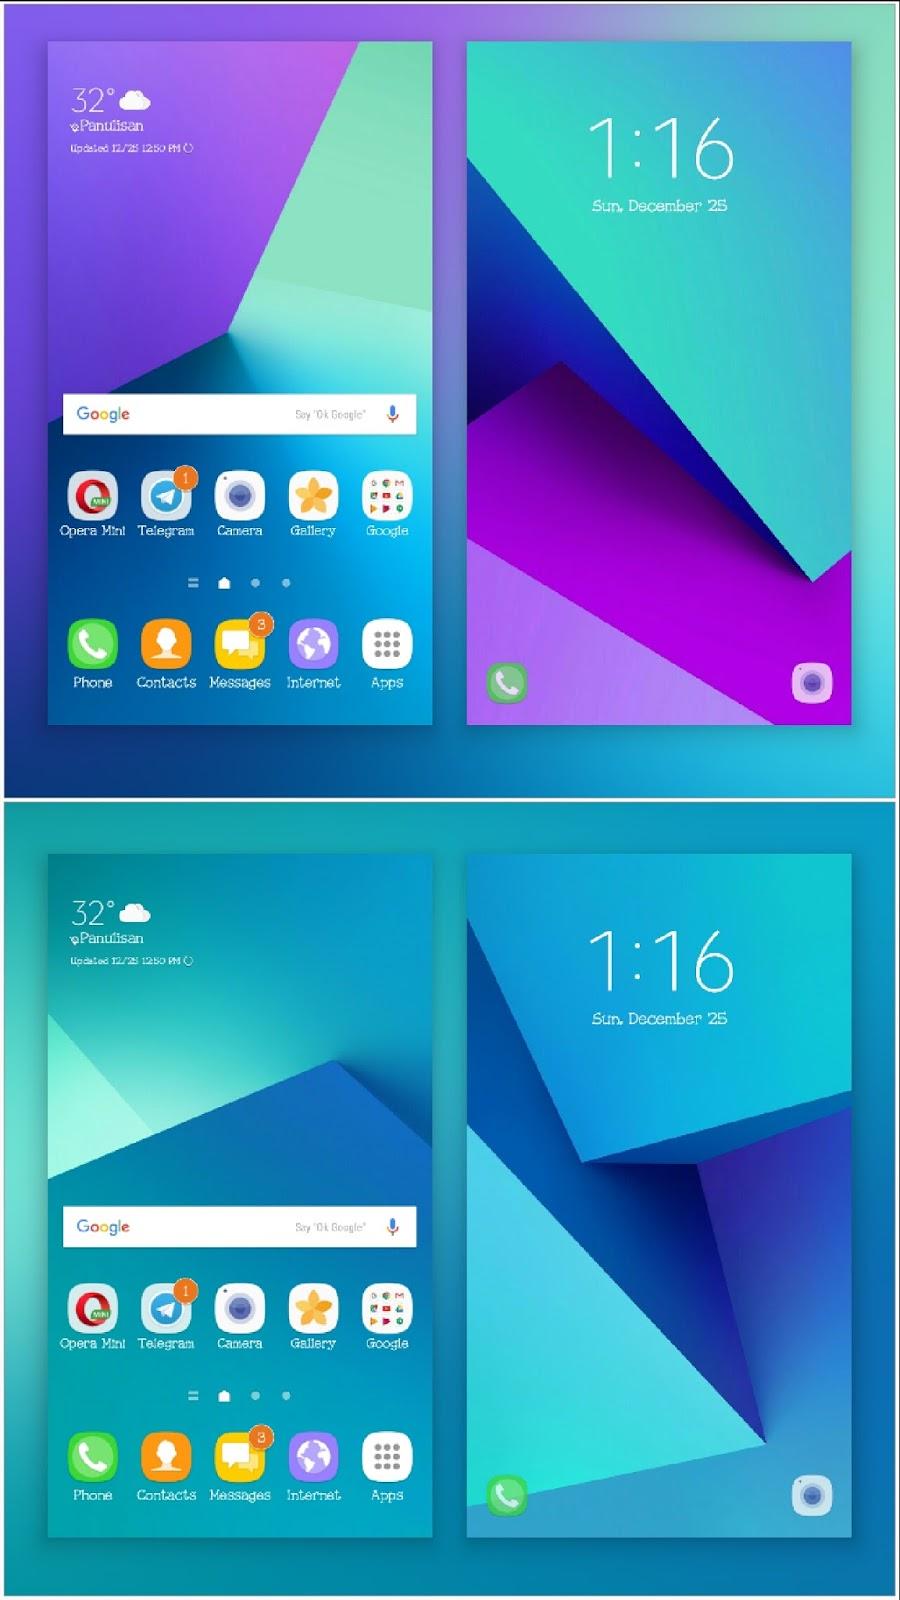 Wallpaper download j2 - Stock Wallpaper Galaxy J2 Prime C9 Pro